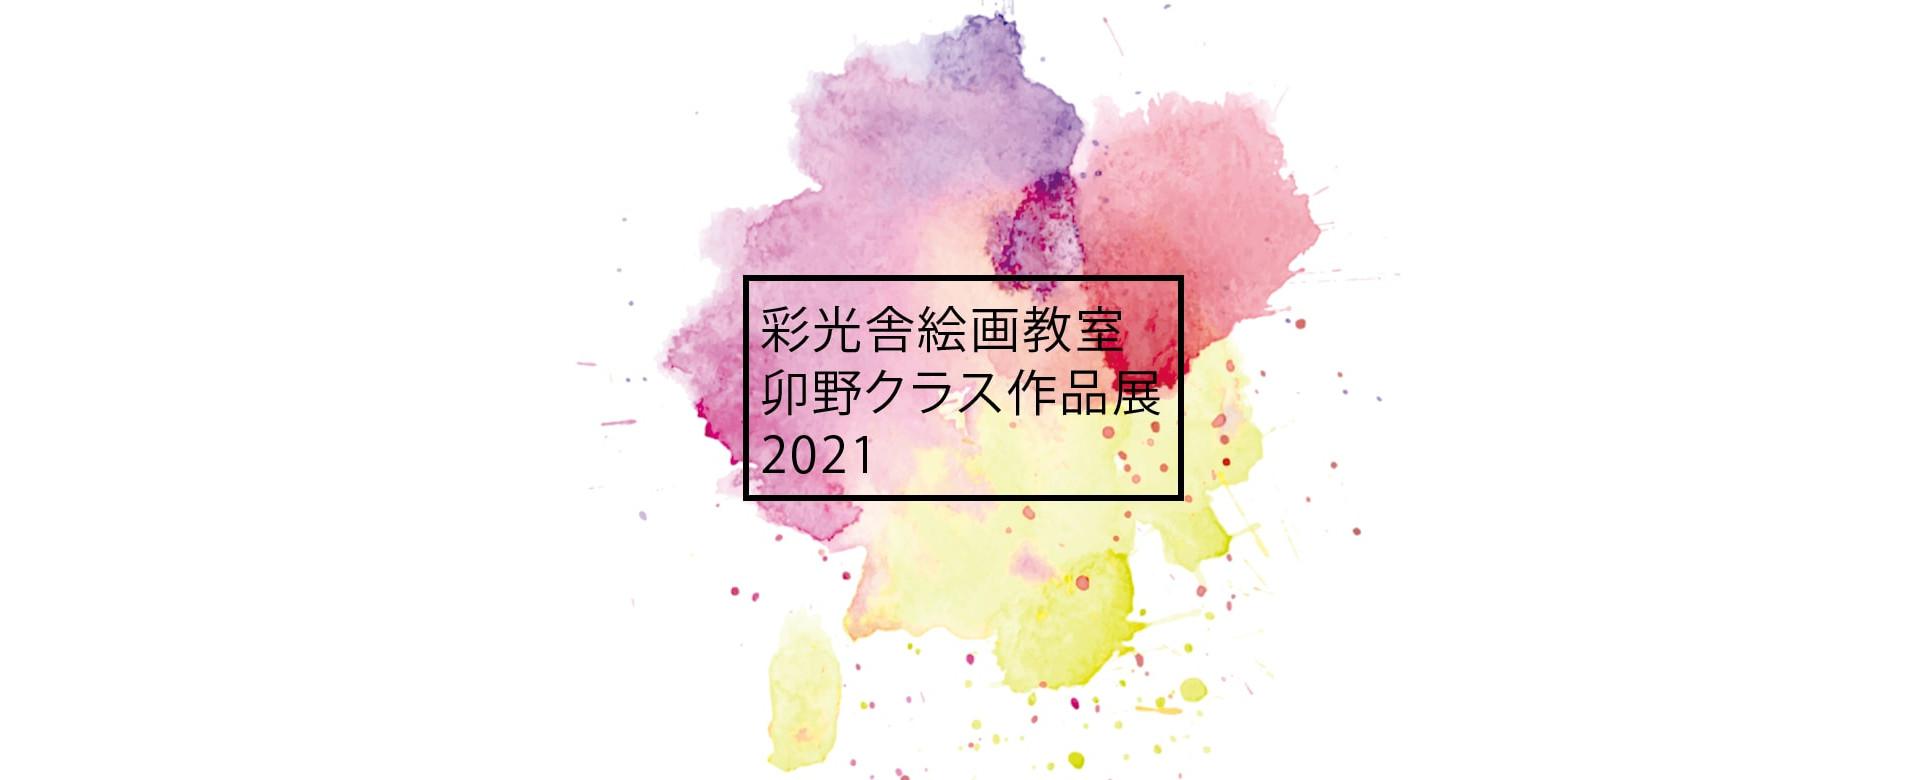 卯野クラス展2021